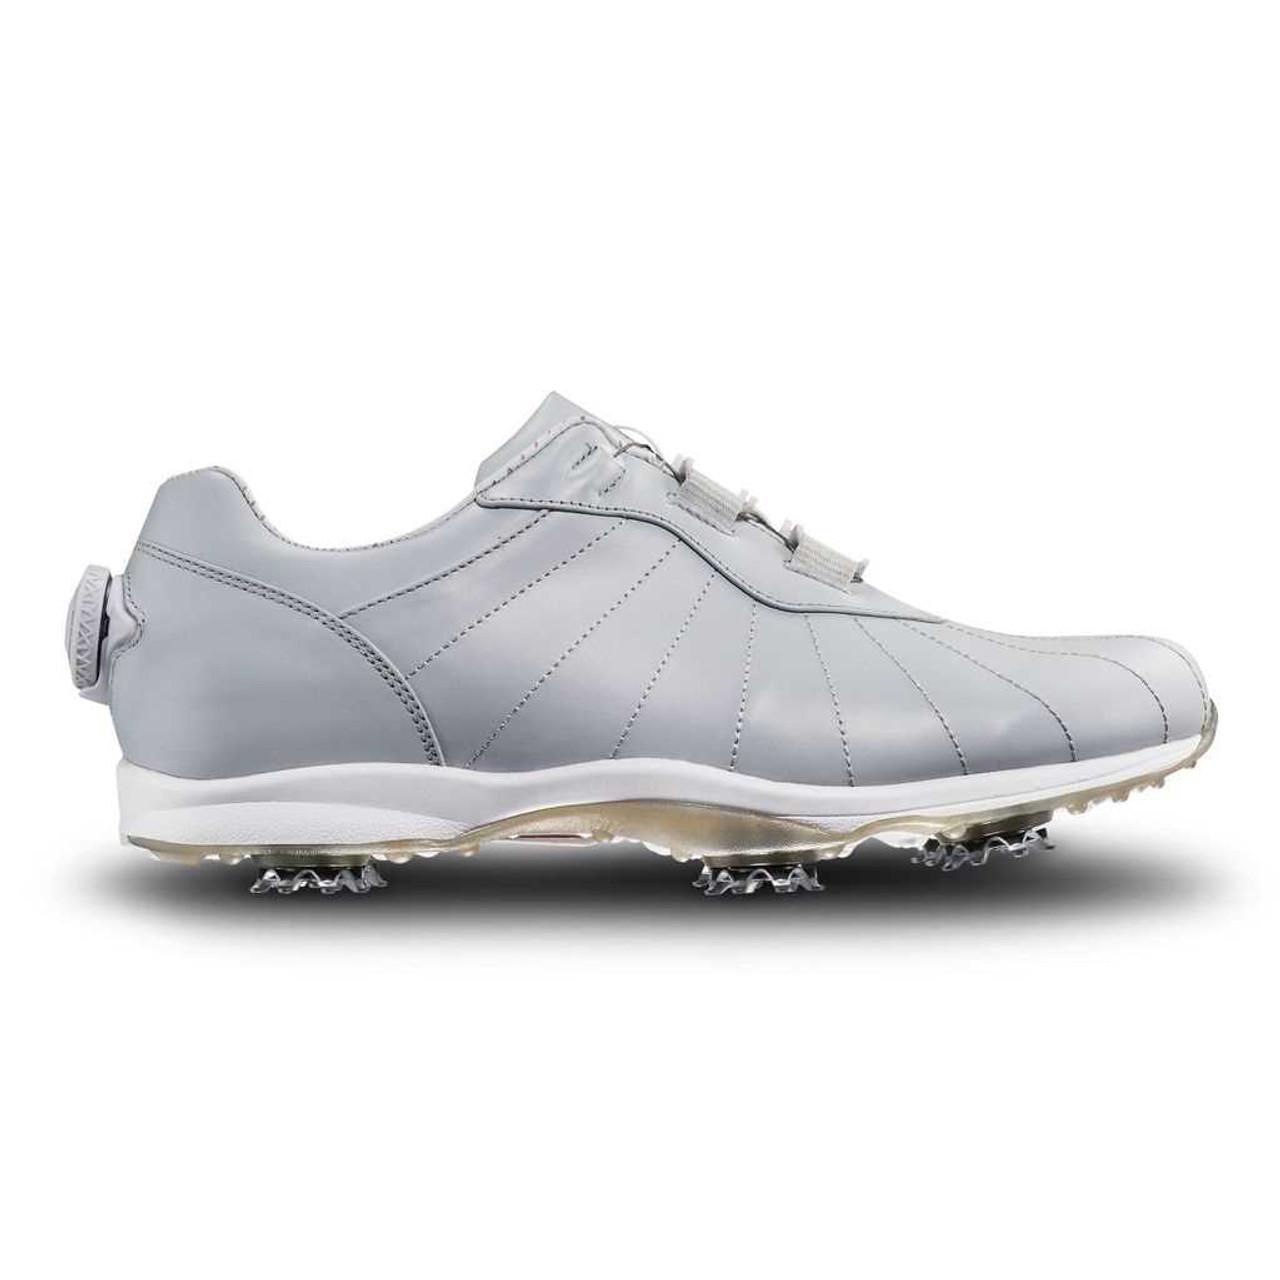 c09faf3eb006bd FootJoy emBODY BOA Women's Golf Shoes () - Arctic